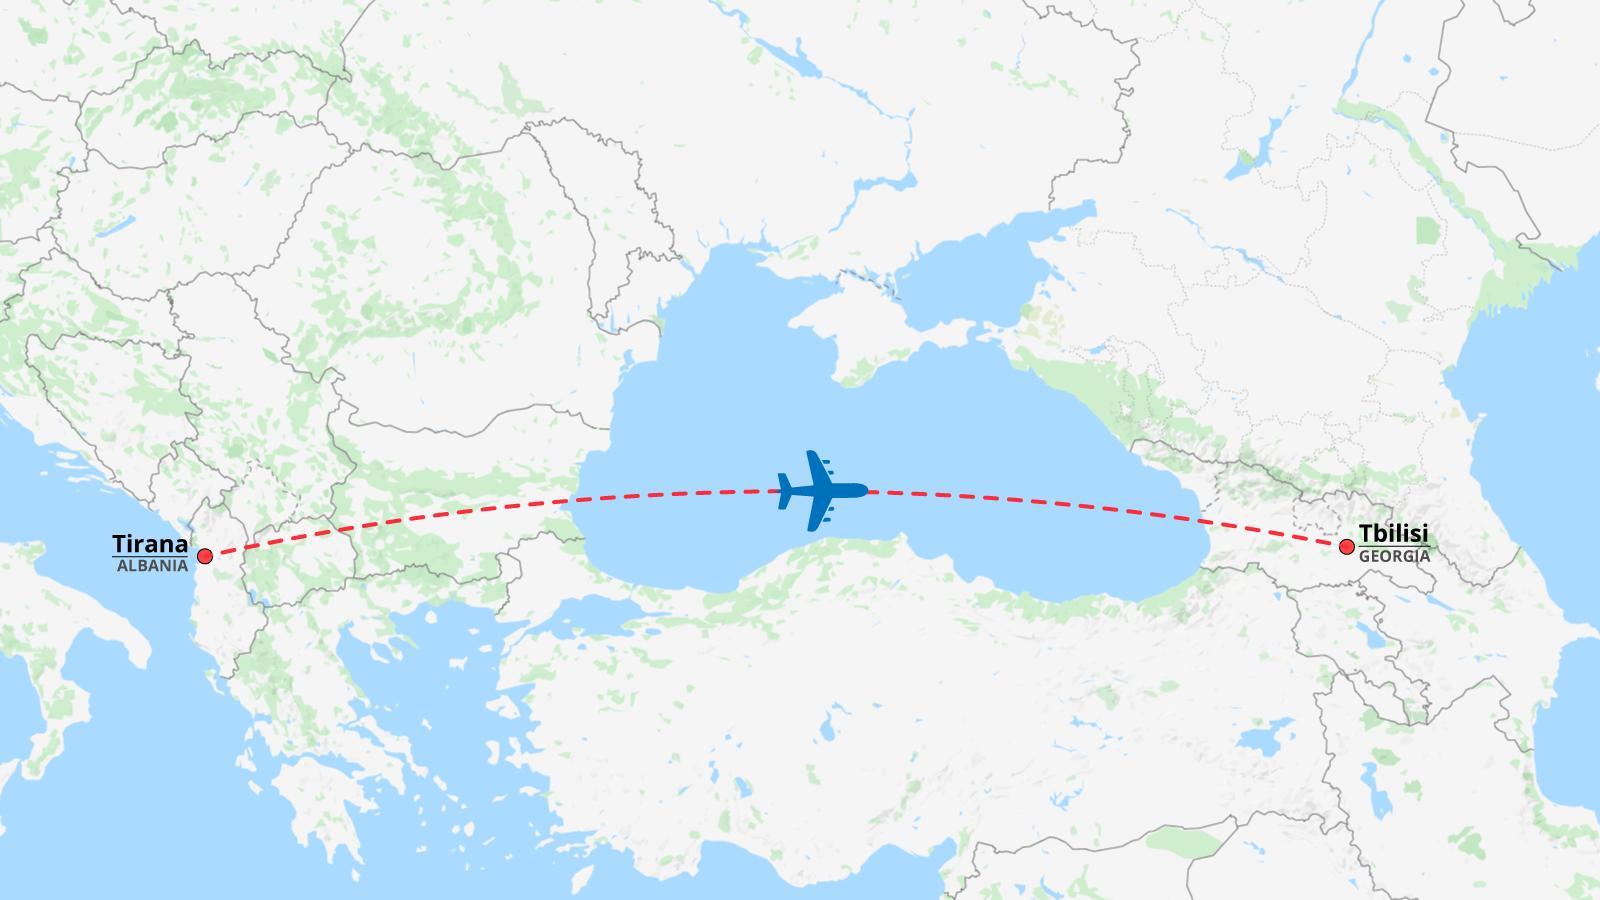 https://www.occrp.org/assets/fraud-factory/Tirana-to-Tbilisi.jpg